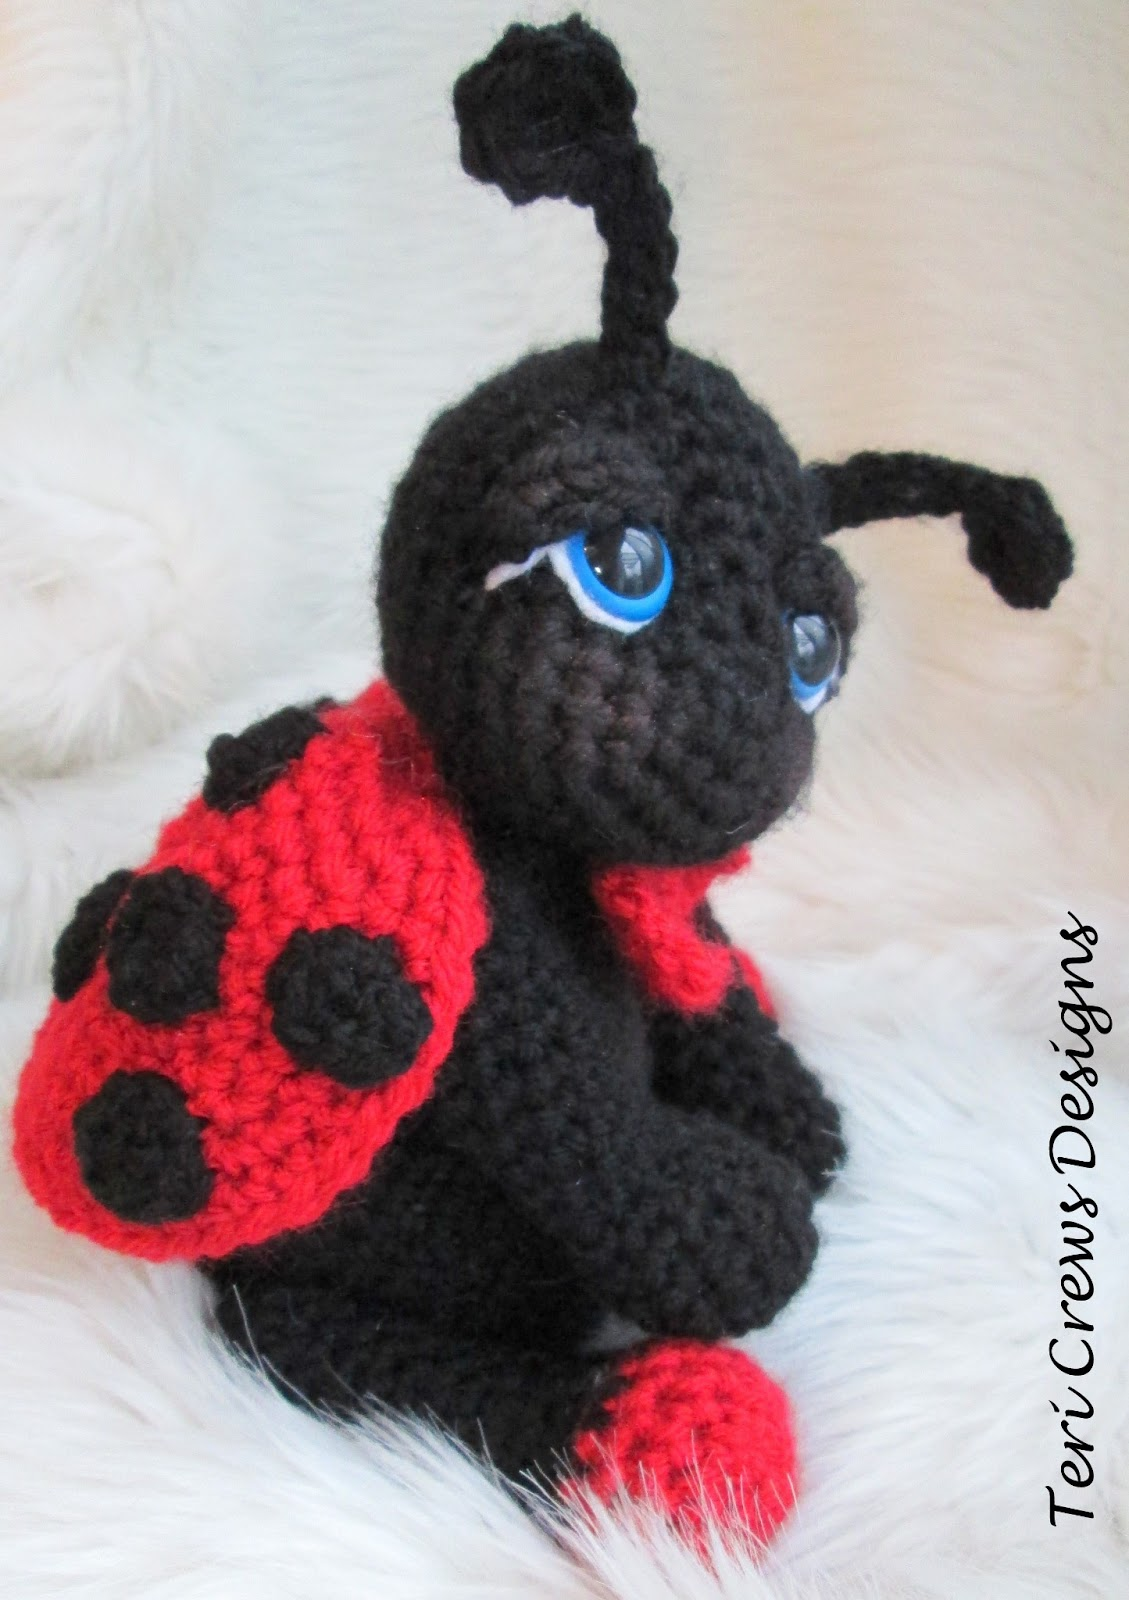 Teris blog new free ladybug pattern new free ladybug pattern bankloansurffo Choice Image